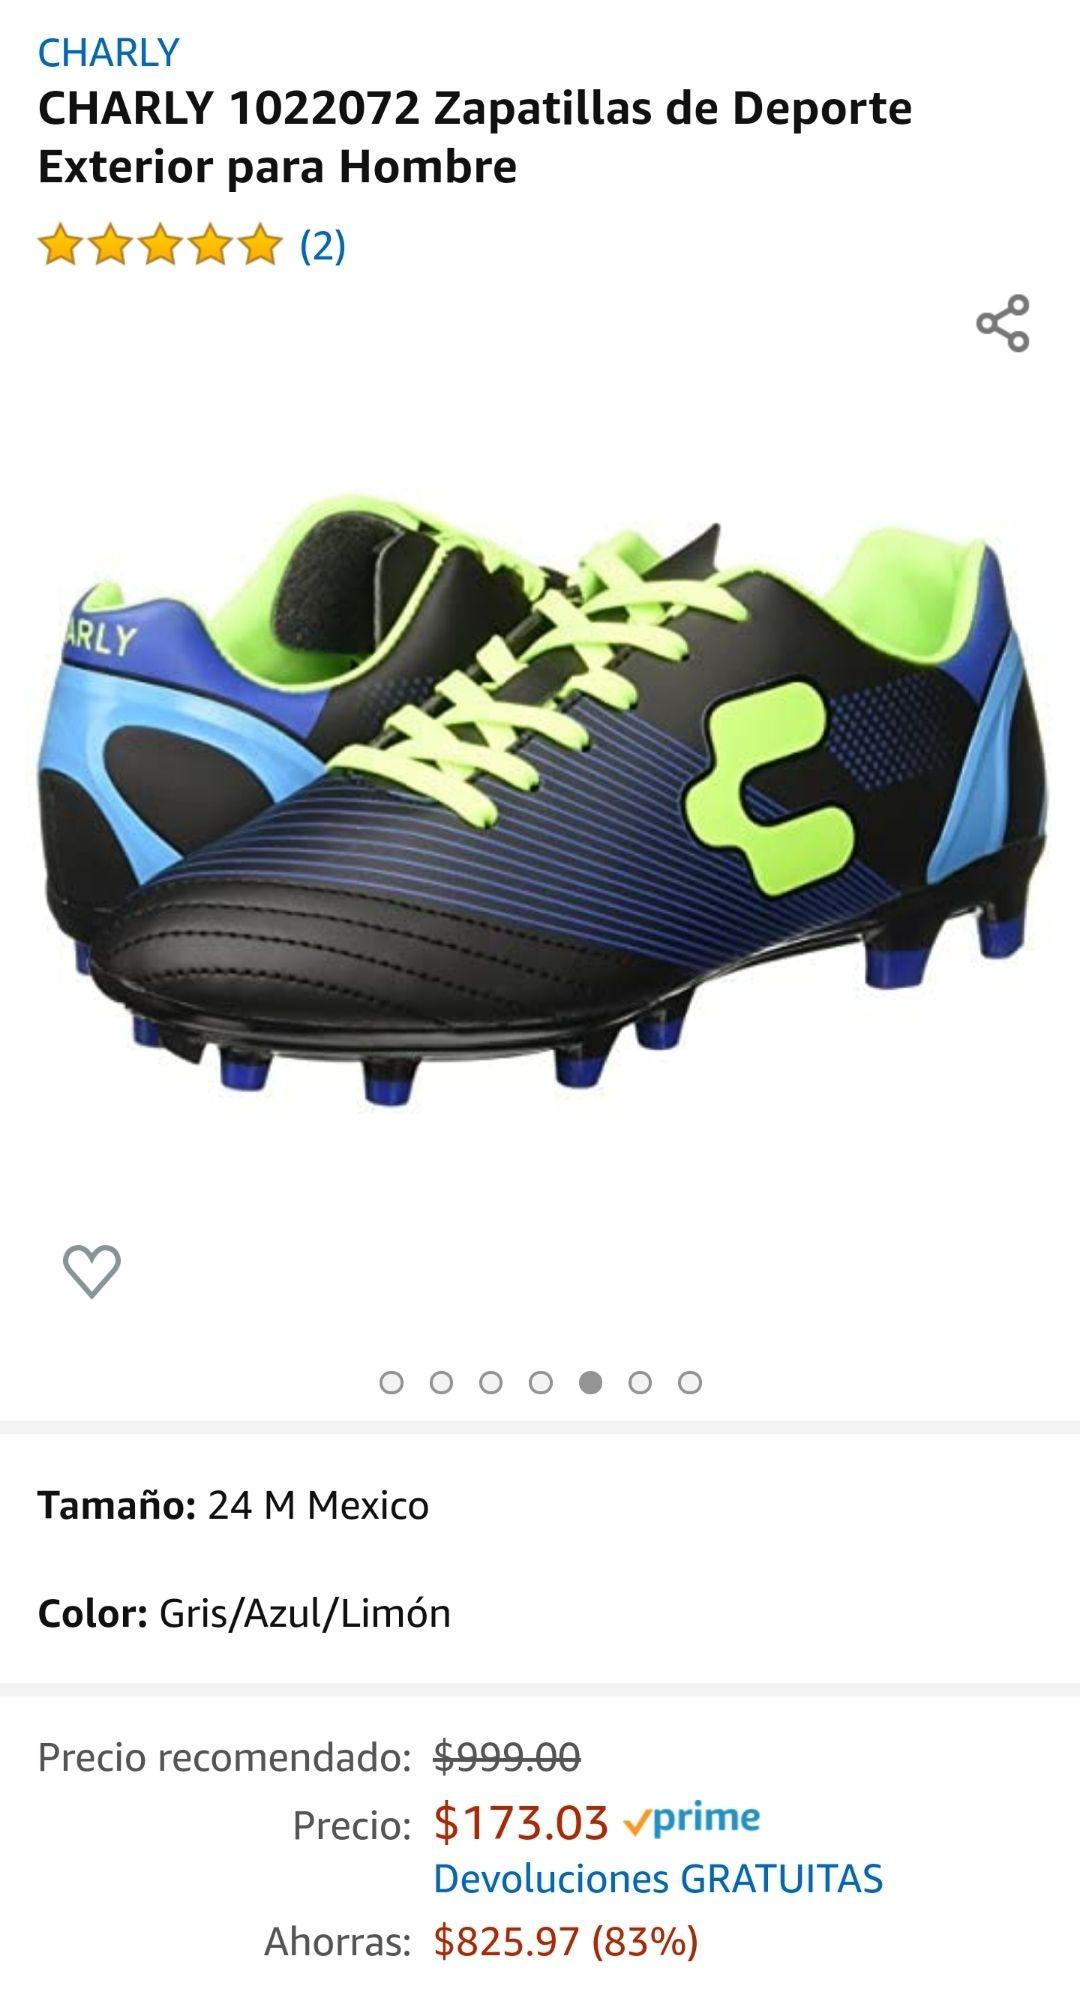 Amazon: Taquetes Charly futbol #24